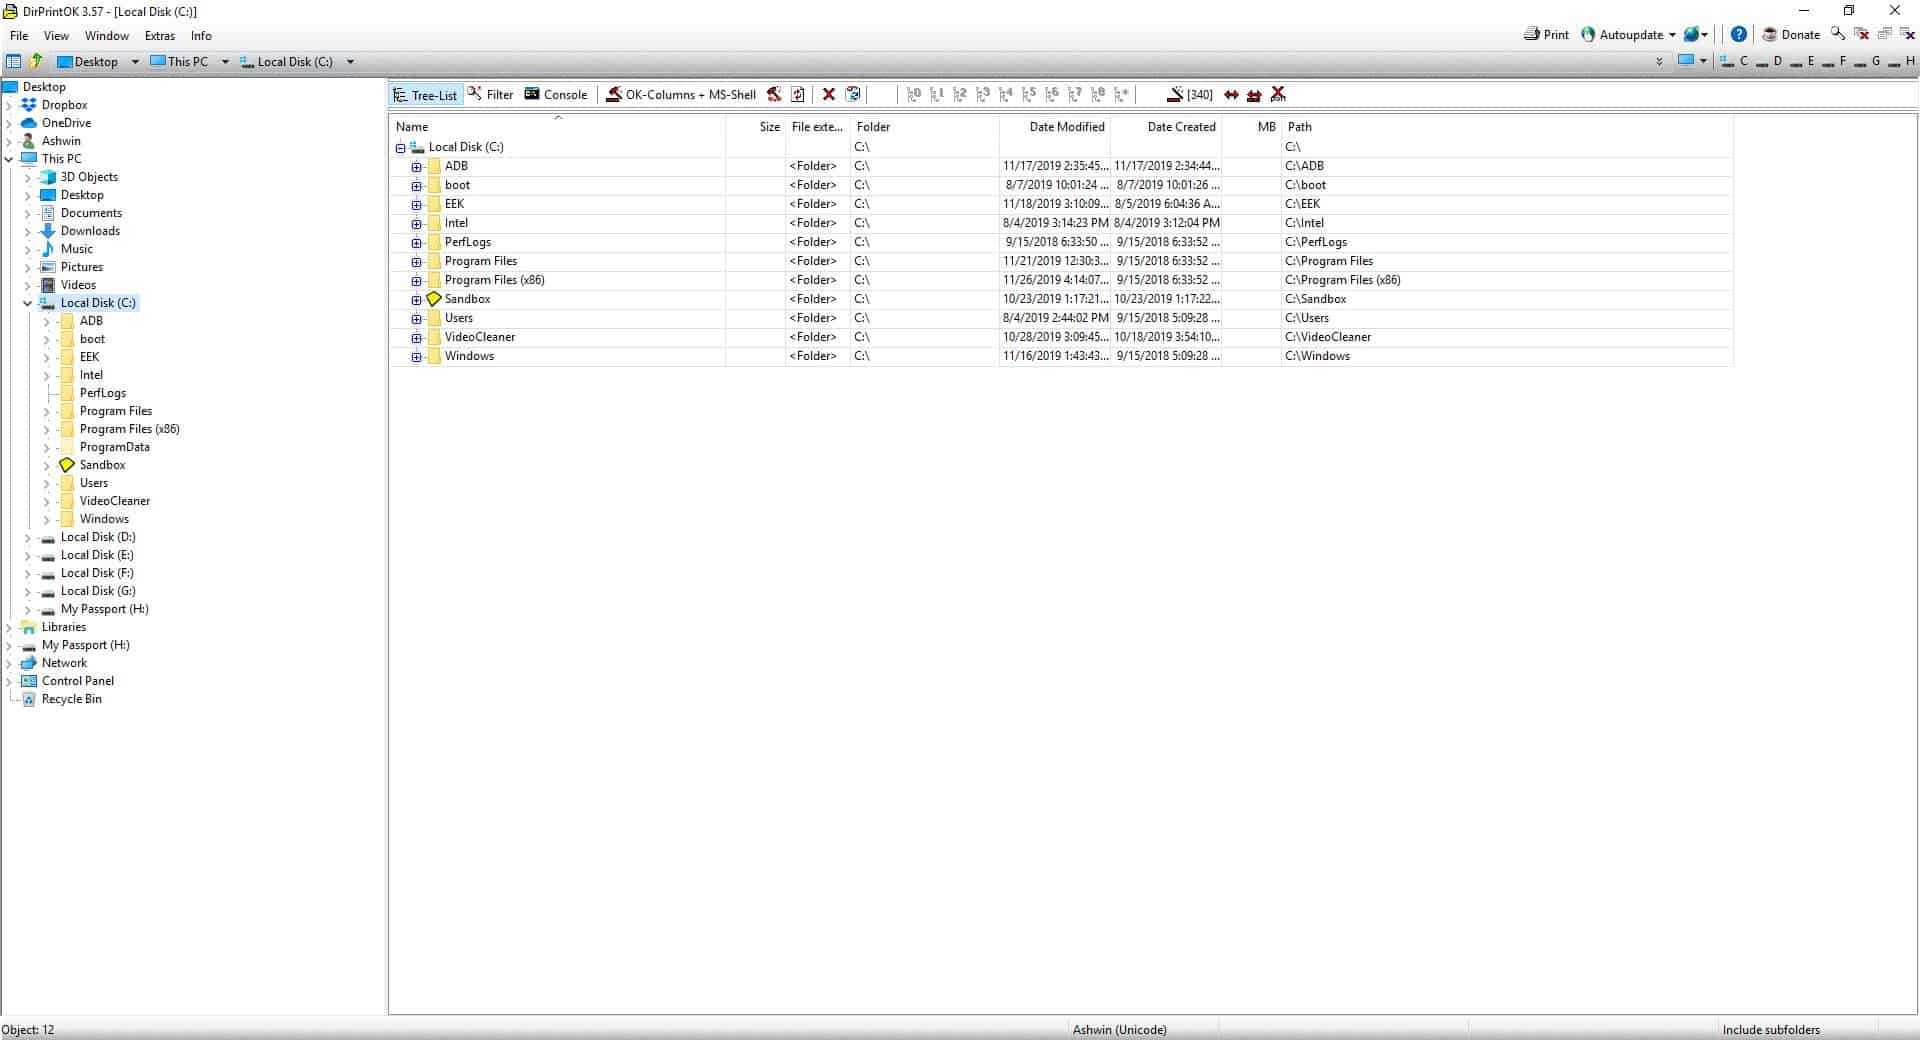 DirPrintOK is a freeware directory printing program from the developer of Q-Dir